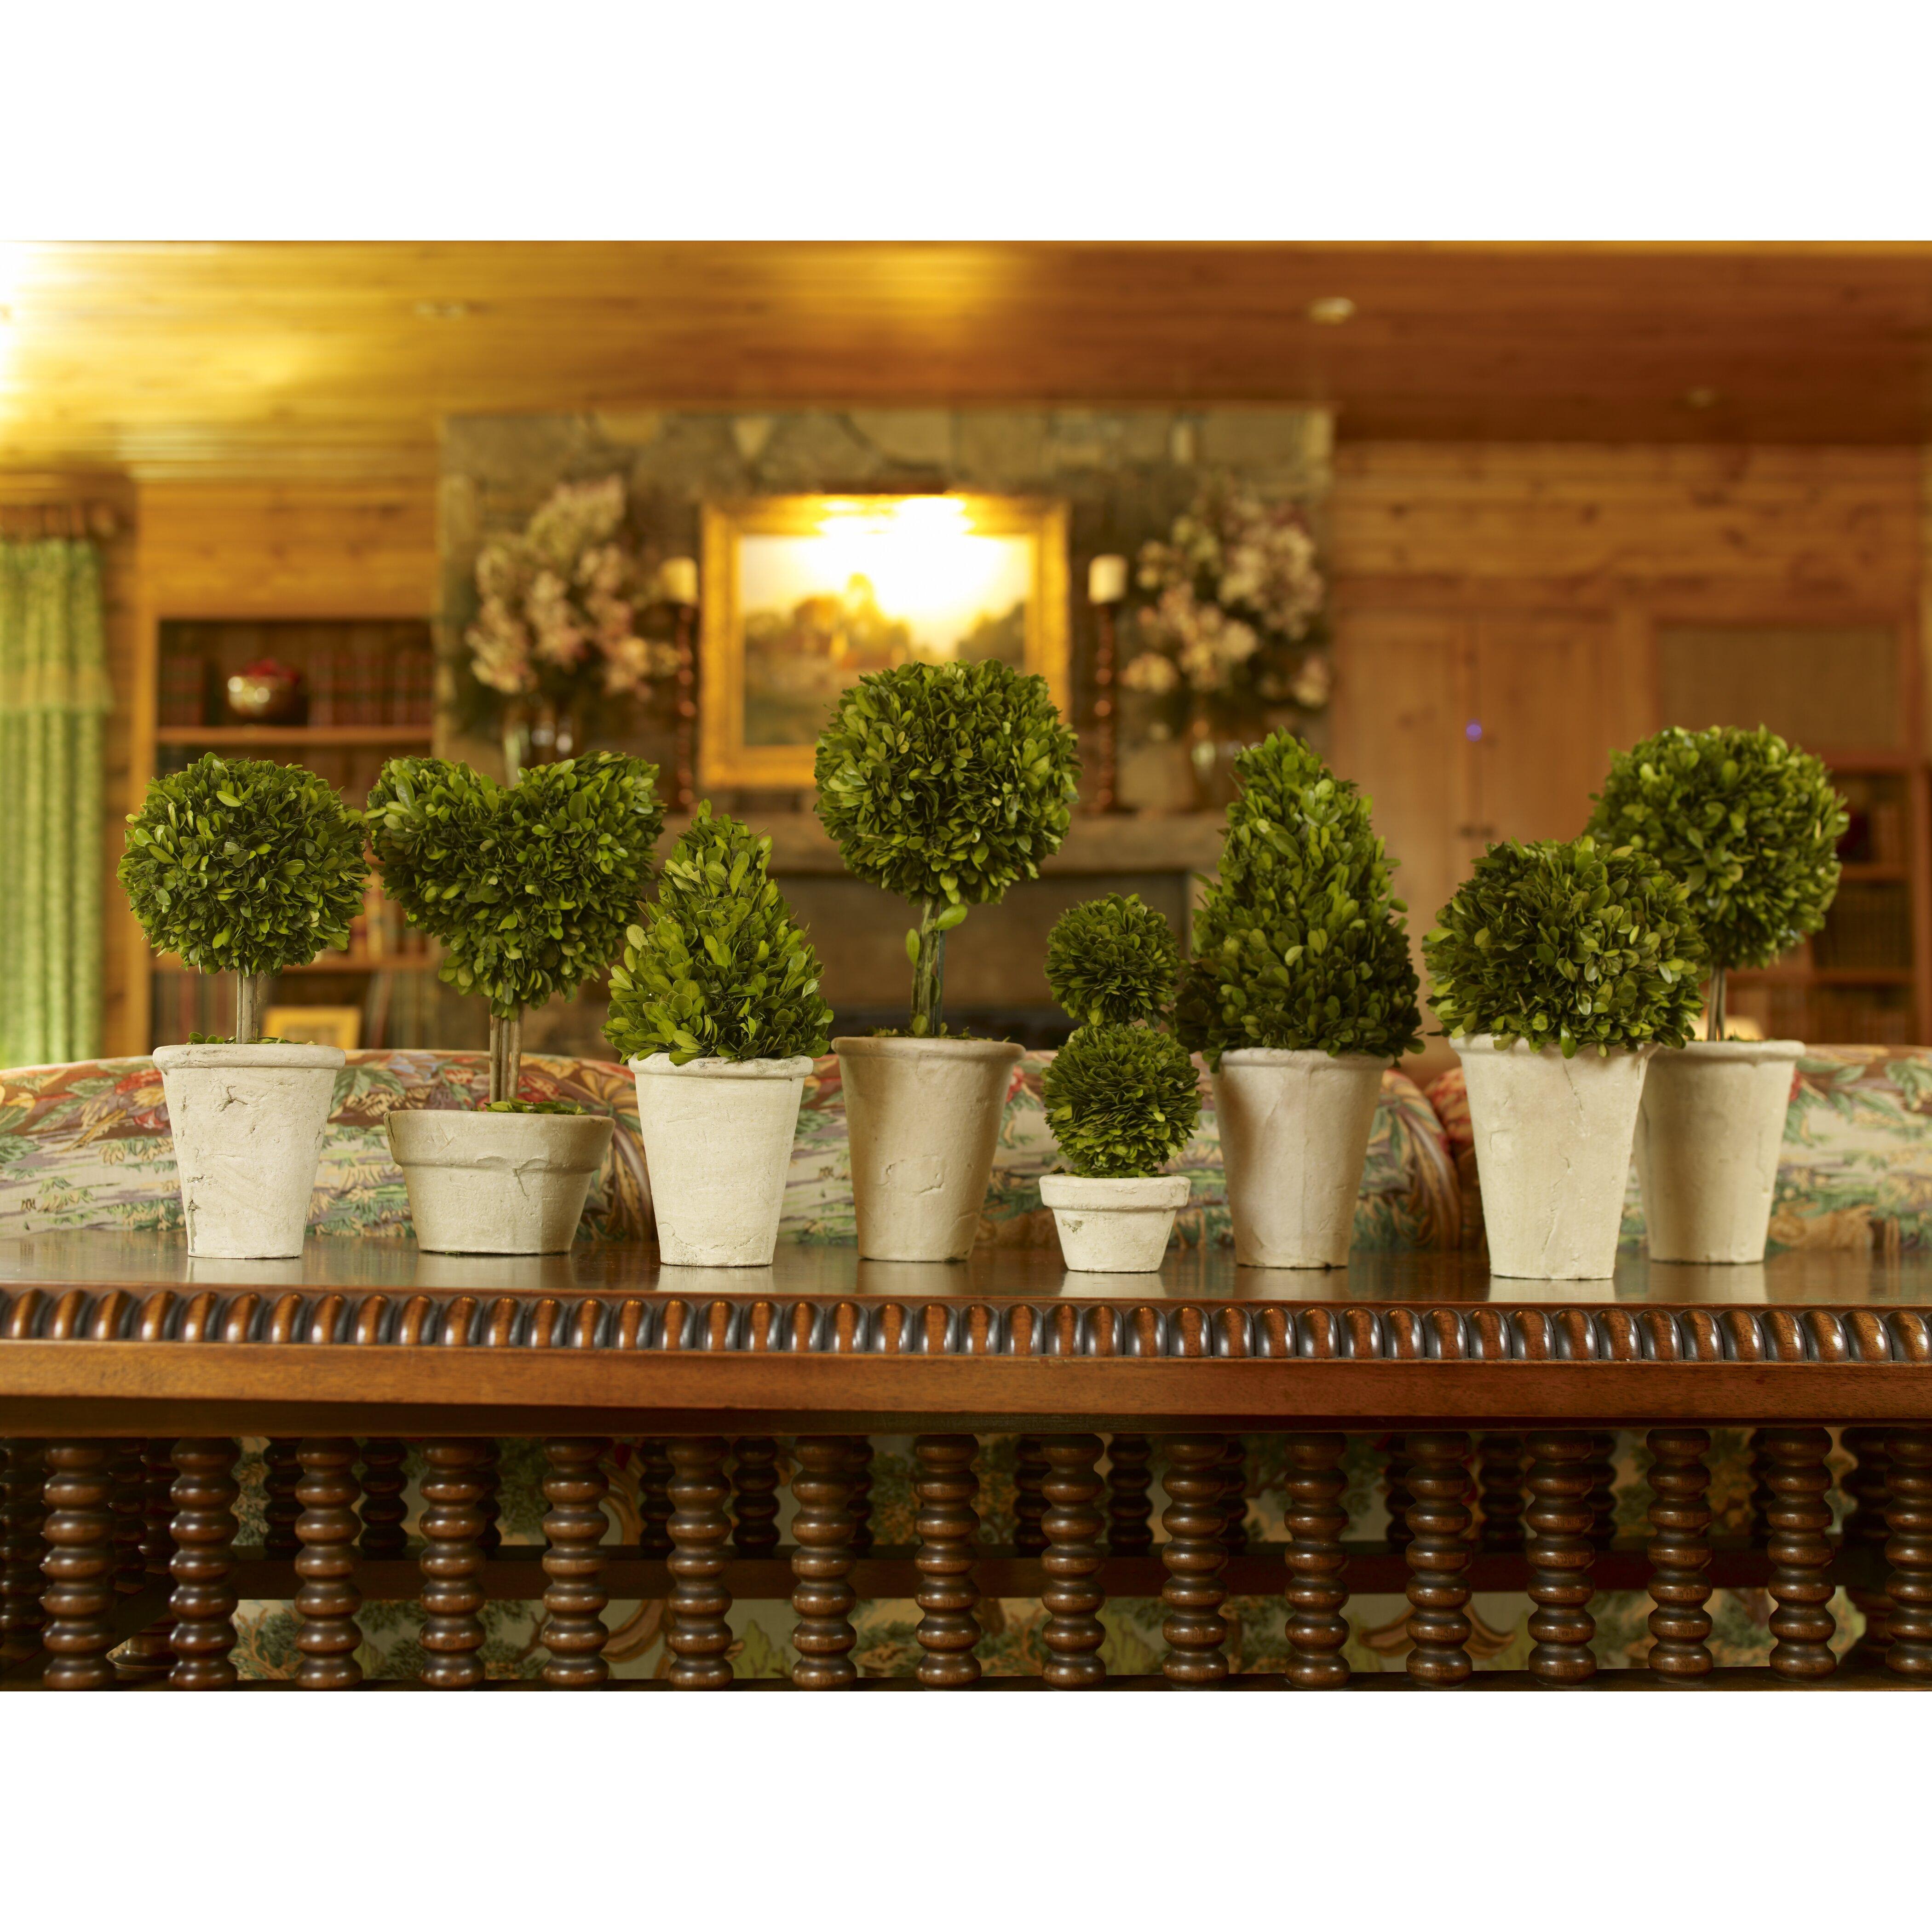 napa home garden 8 piece preserved boxwood topiary in pot set reviews wayfair